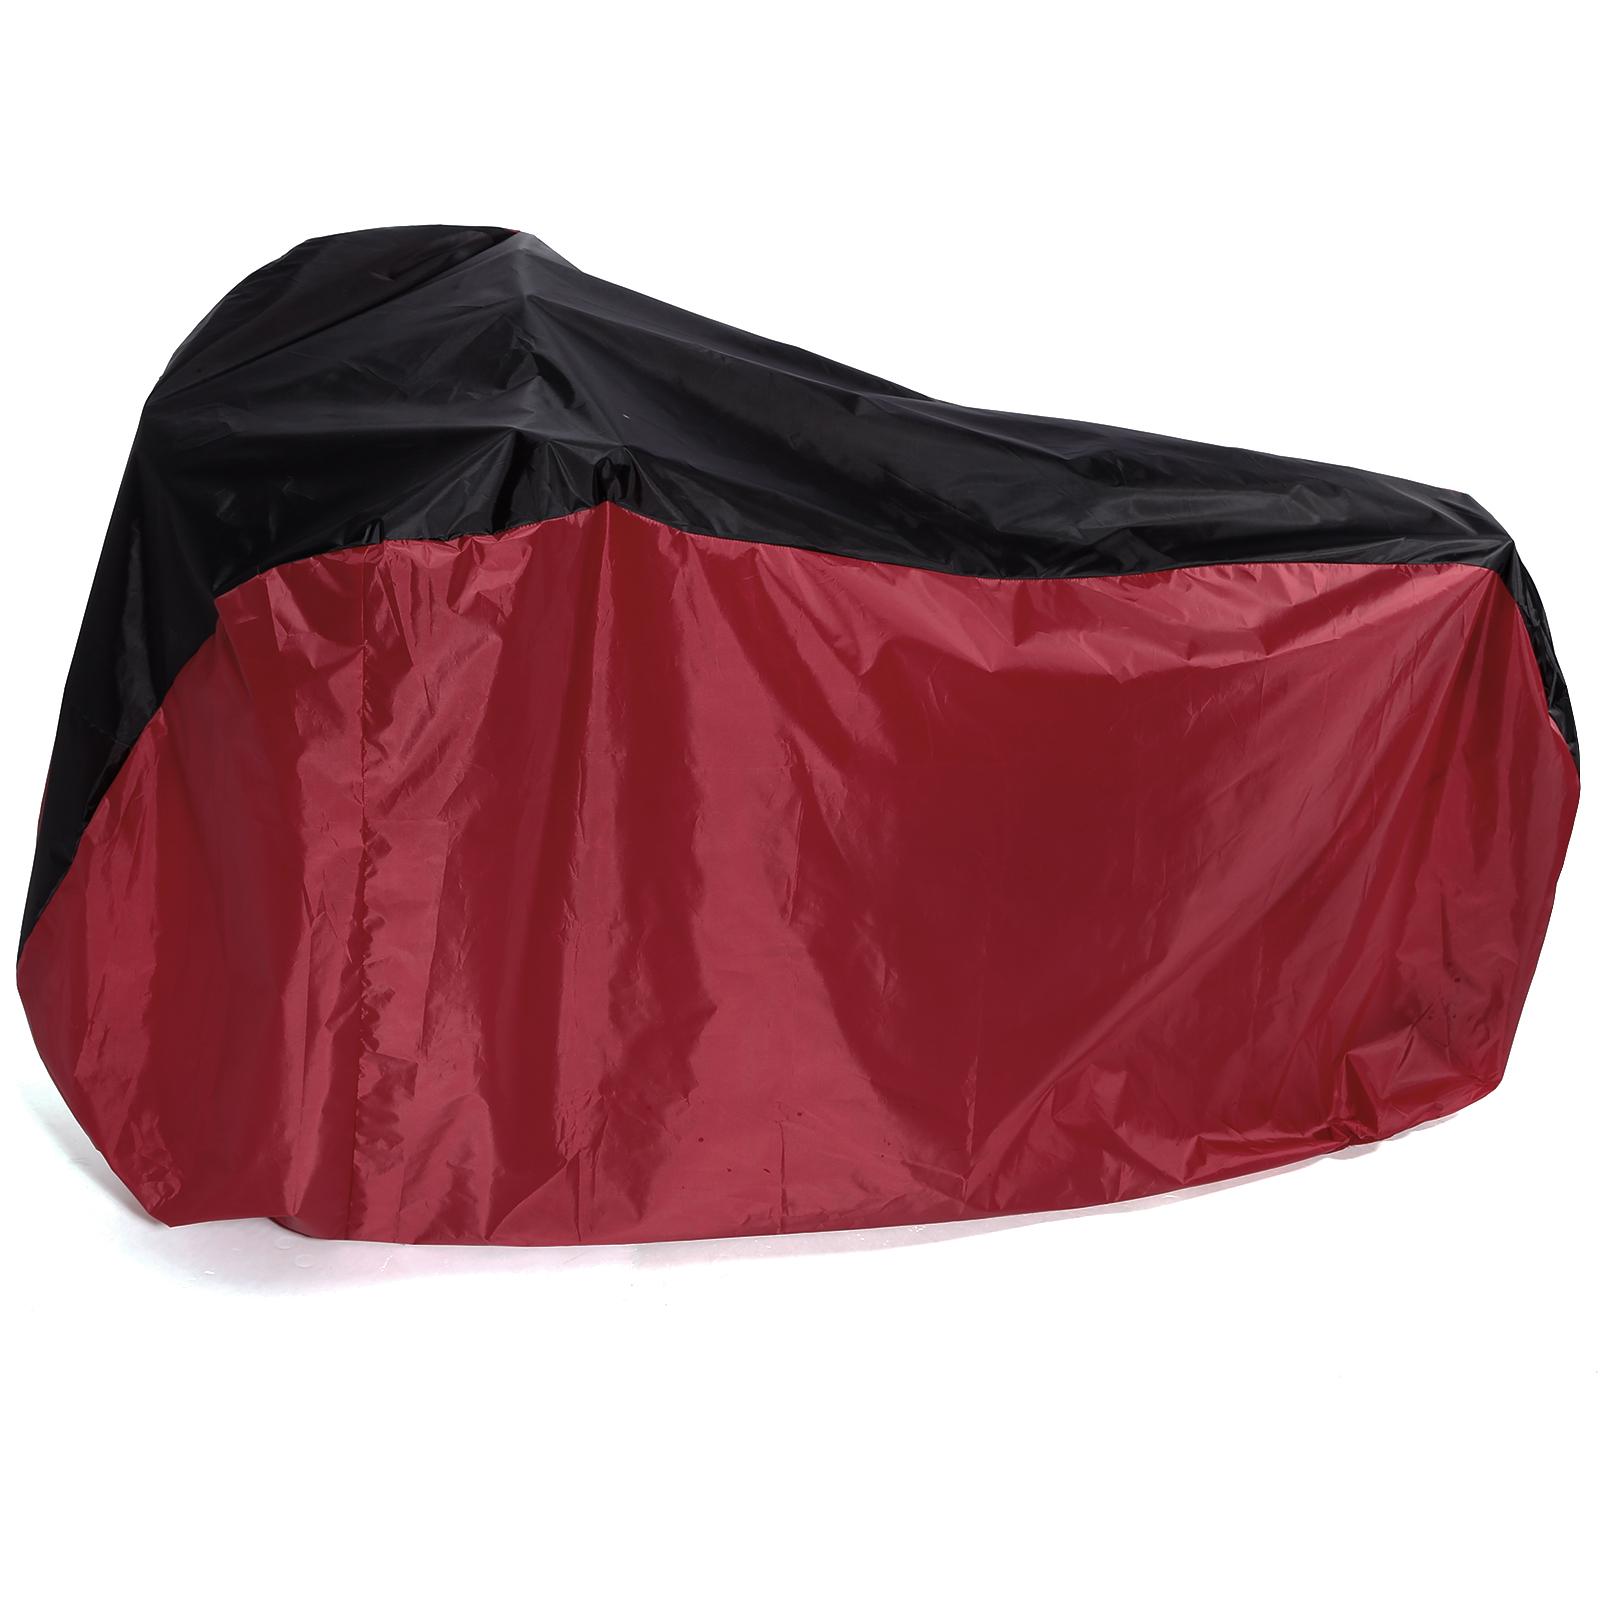 fahrrad h lle schutzabdeckung abdeck plane fahrradgarage f r bis 3 fahrr der ebay. Black Bedroom Furniture Sets. Home Design Ideas